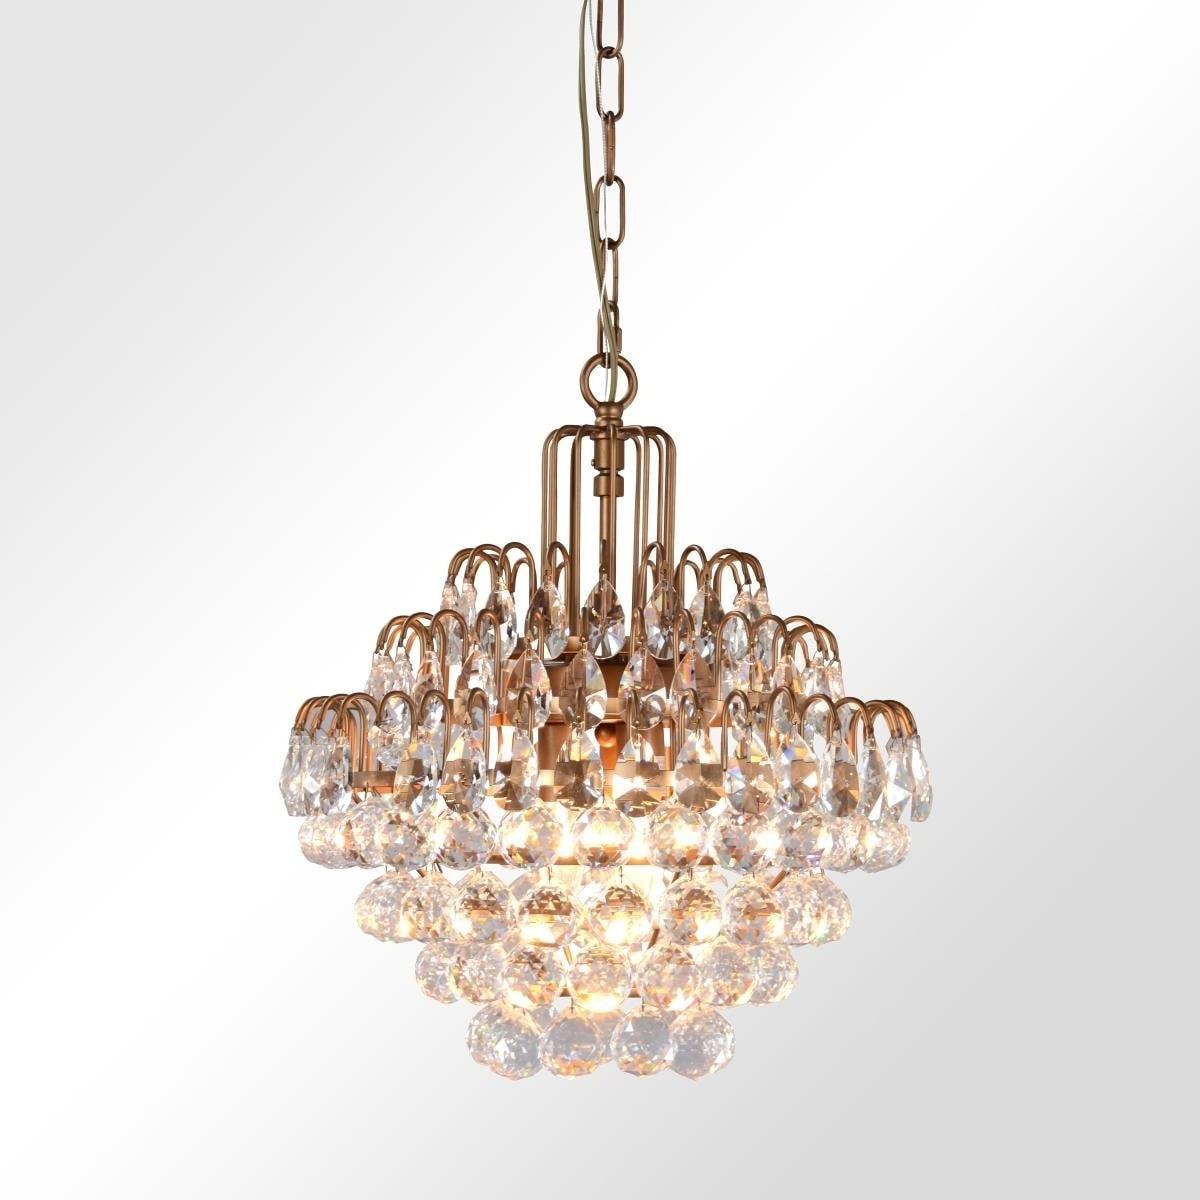 Thayer Antique Brass 3-Light Teardrop Crystal Chandelier by Kosas Home - Antique  Brass Finish - 17H x 16W x 16D - Shop Thayer Antique Brass 3-Light Teardrop Crystal Chandelier By